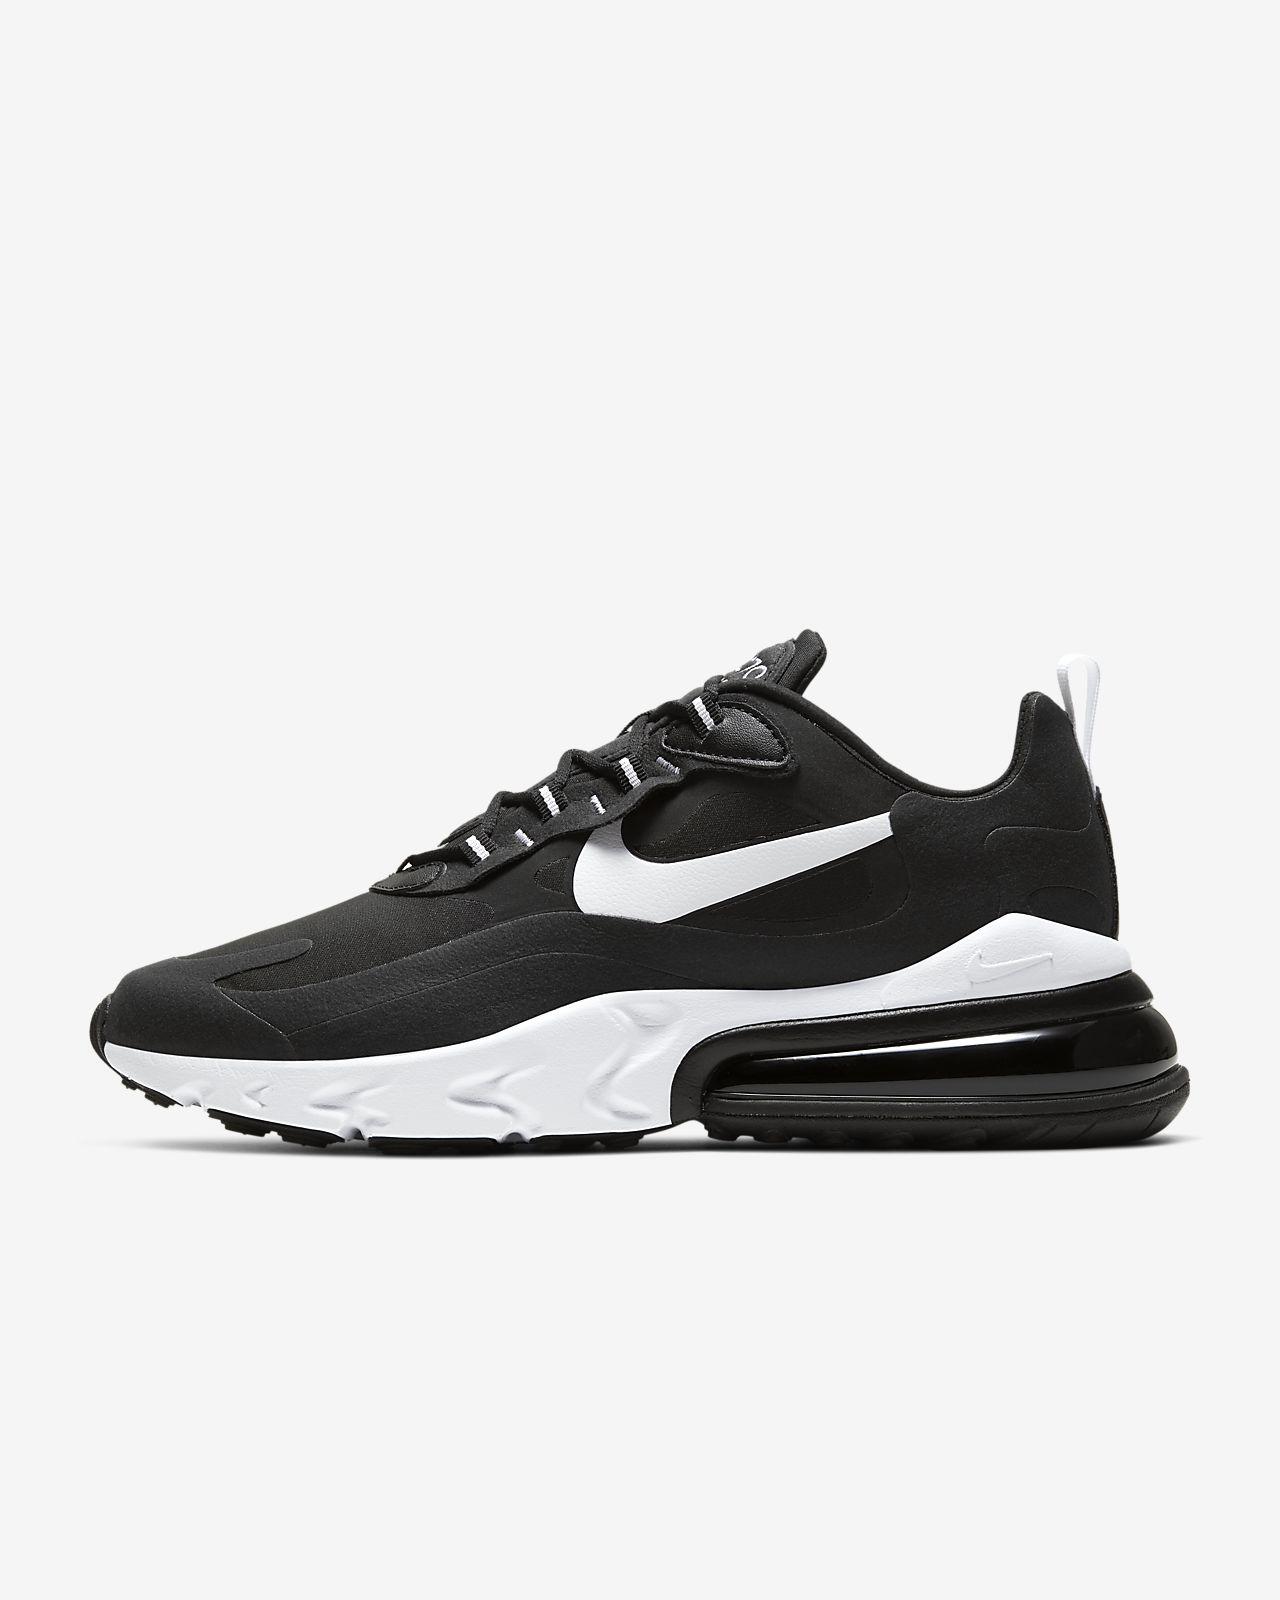 Nike Air Max 270 React Men's Shoe